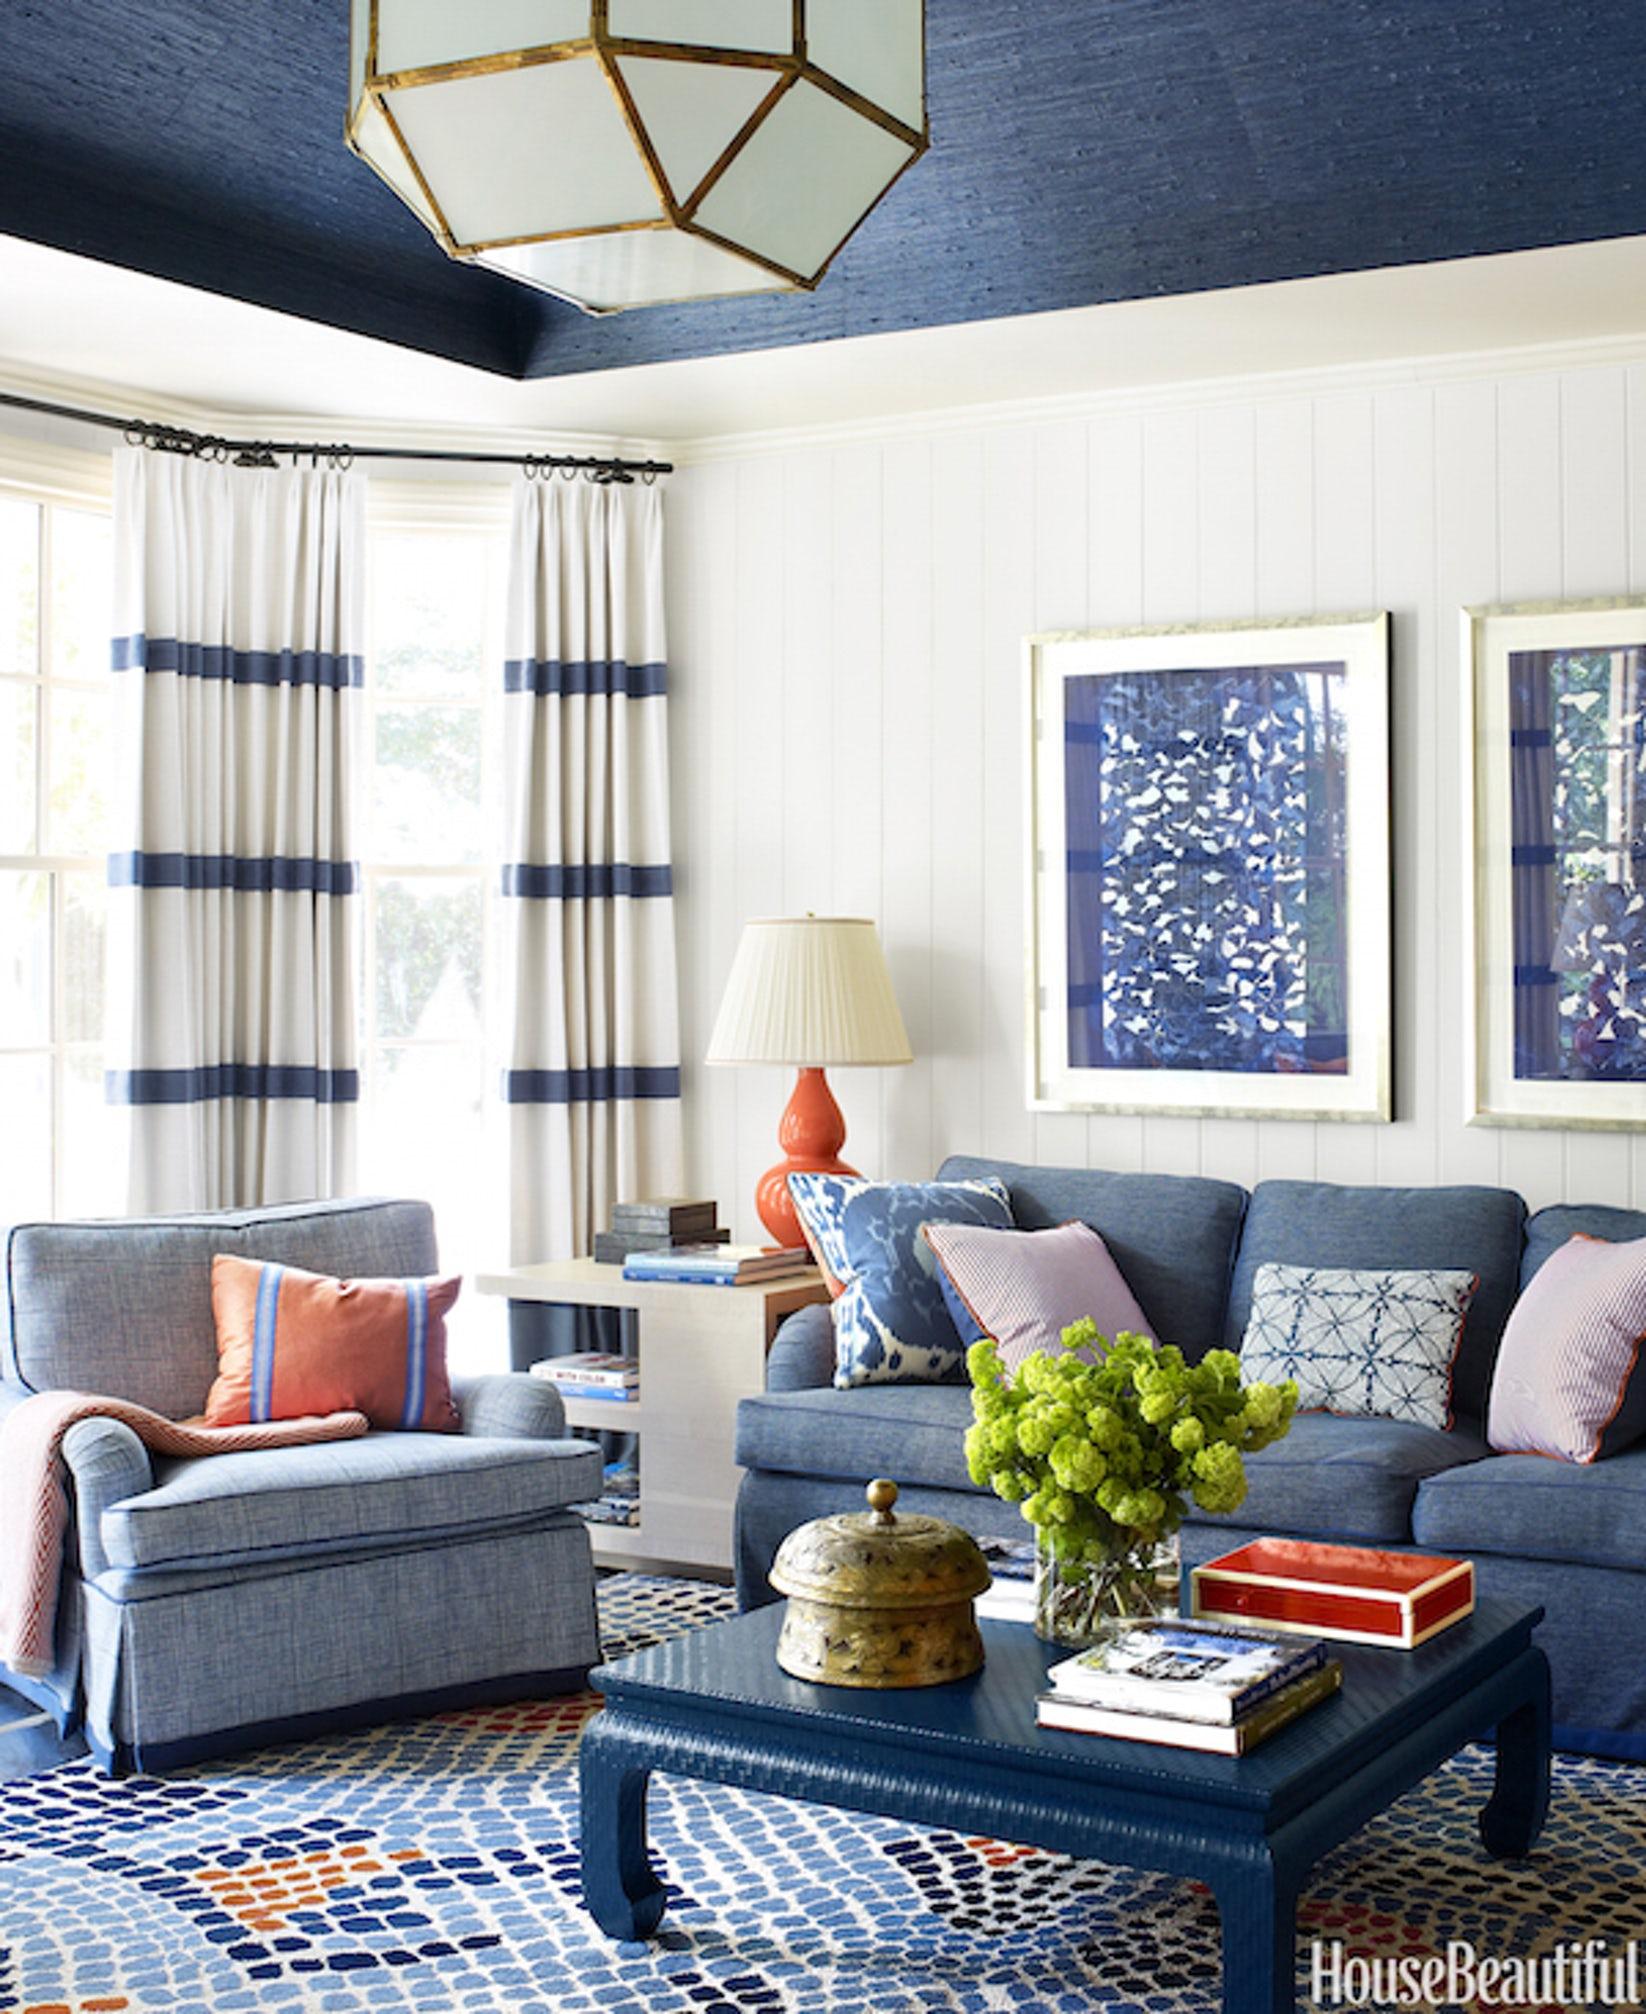 Image of  Linsey Coral Harper 's beautiful design via  Dering Hall .